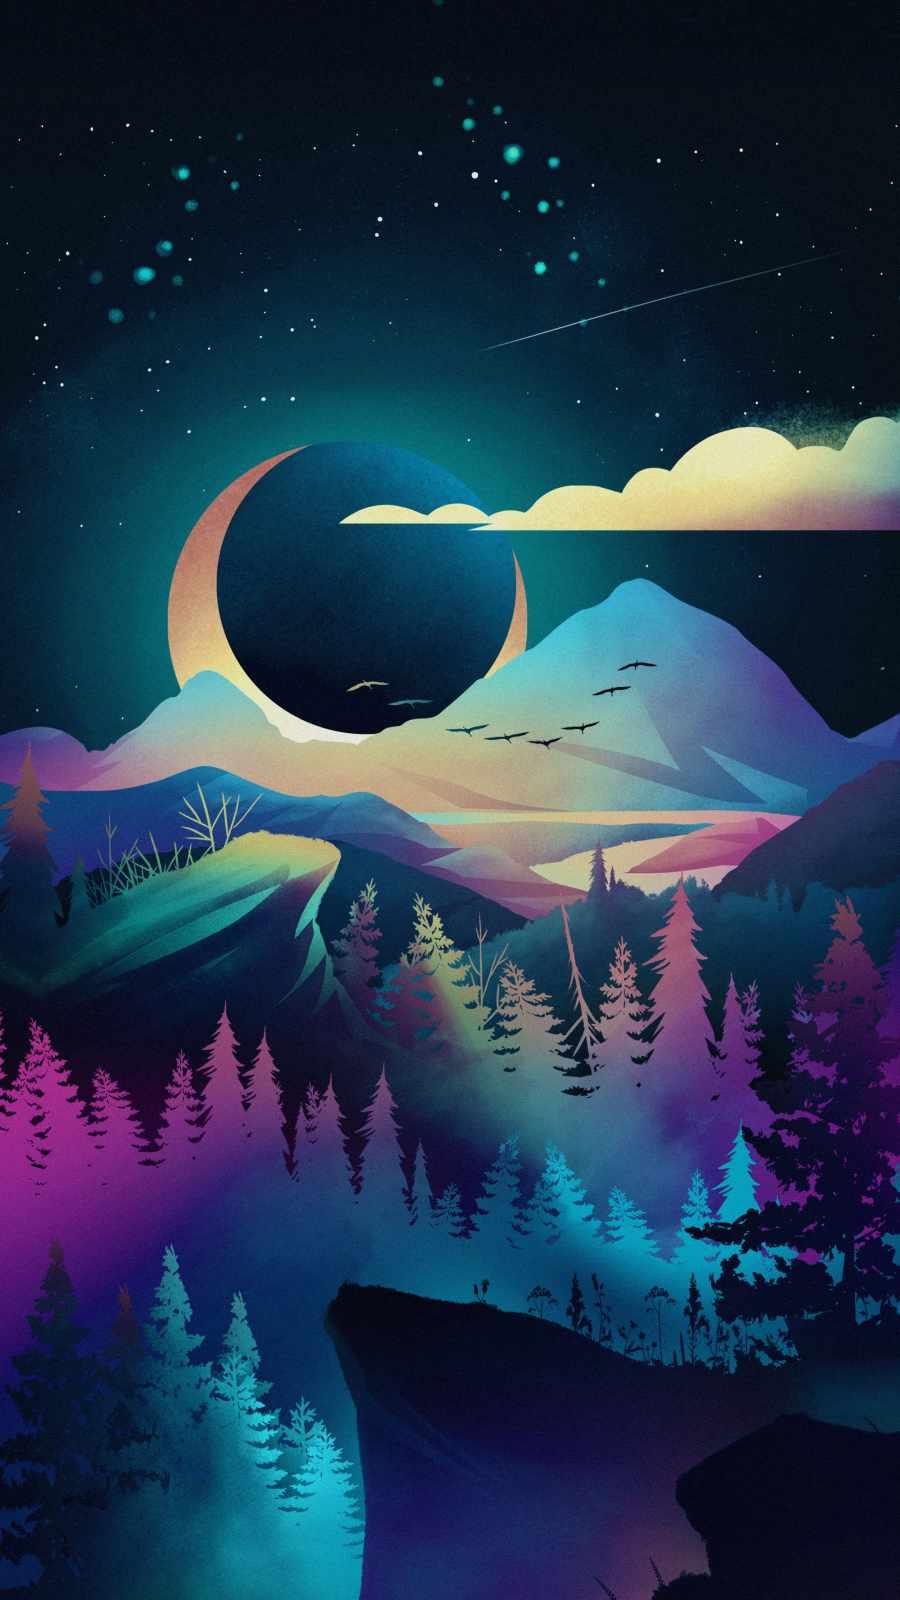 Night Forest Art iPhone Wallpaper